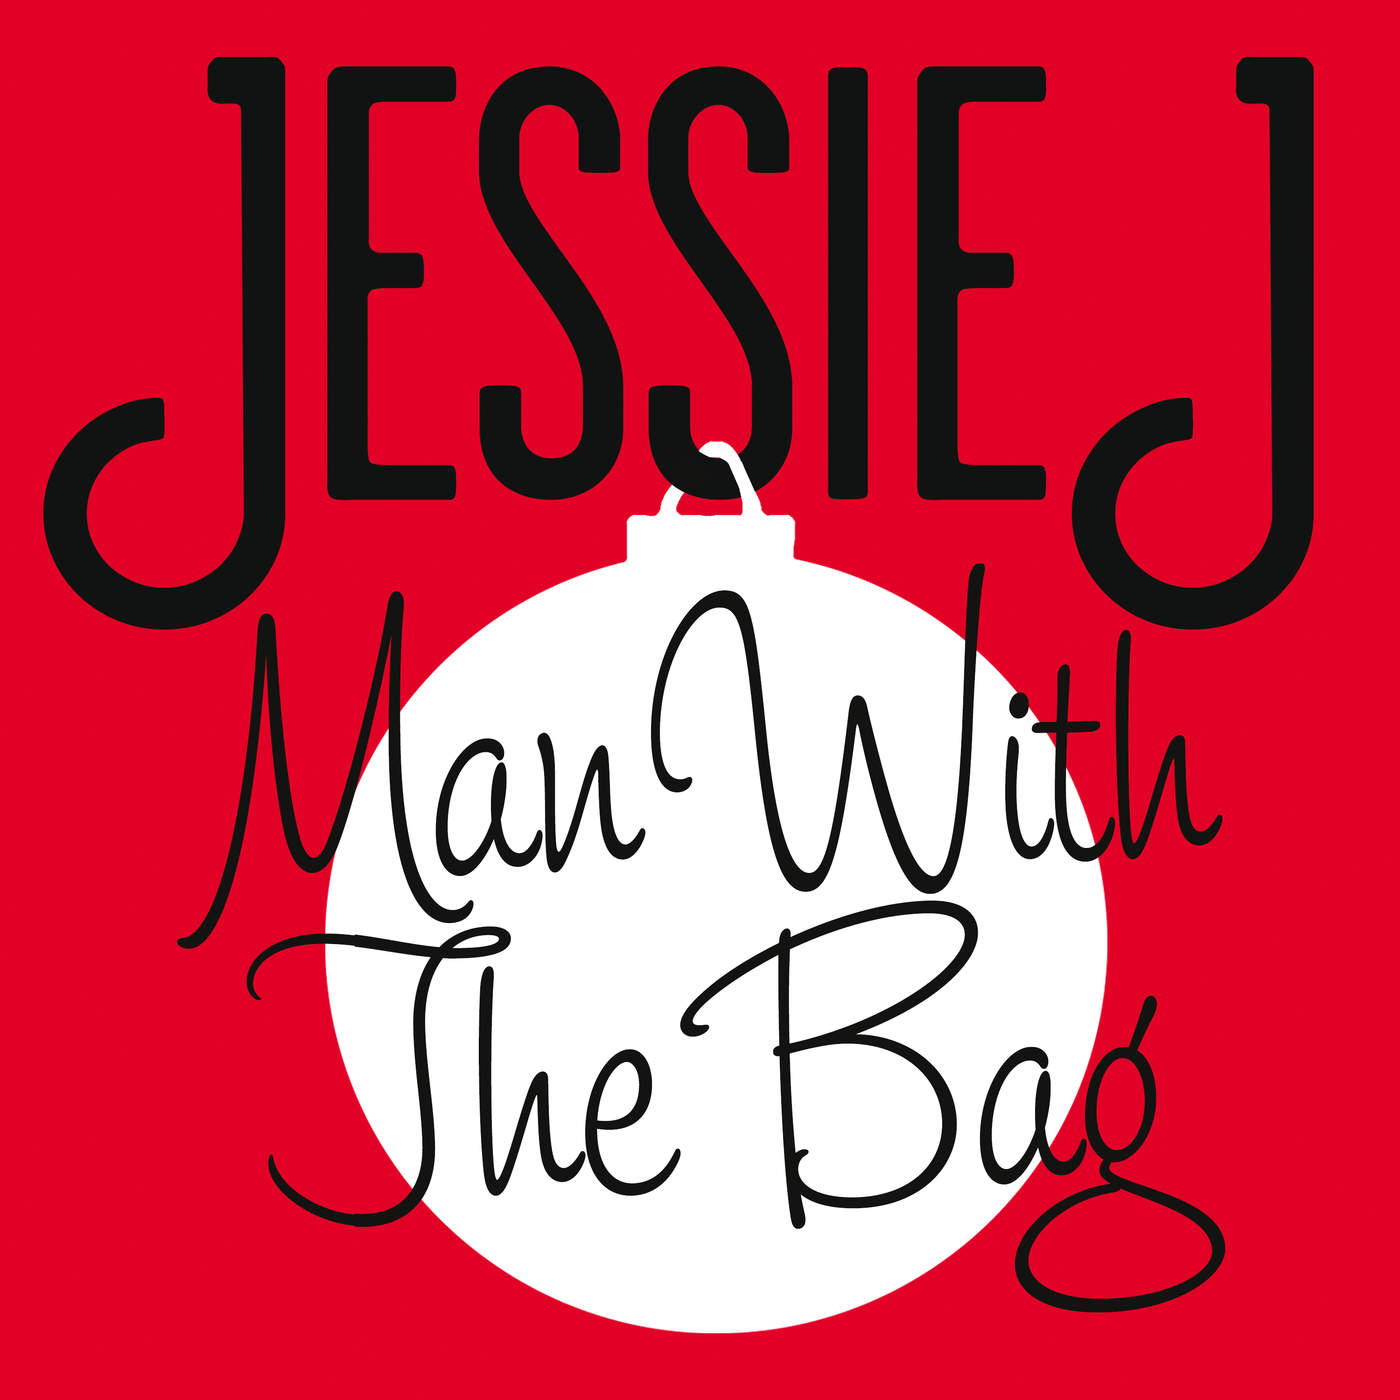 Jessie J - Man with the Bag - Single